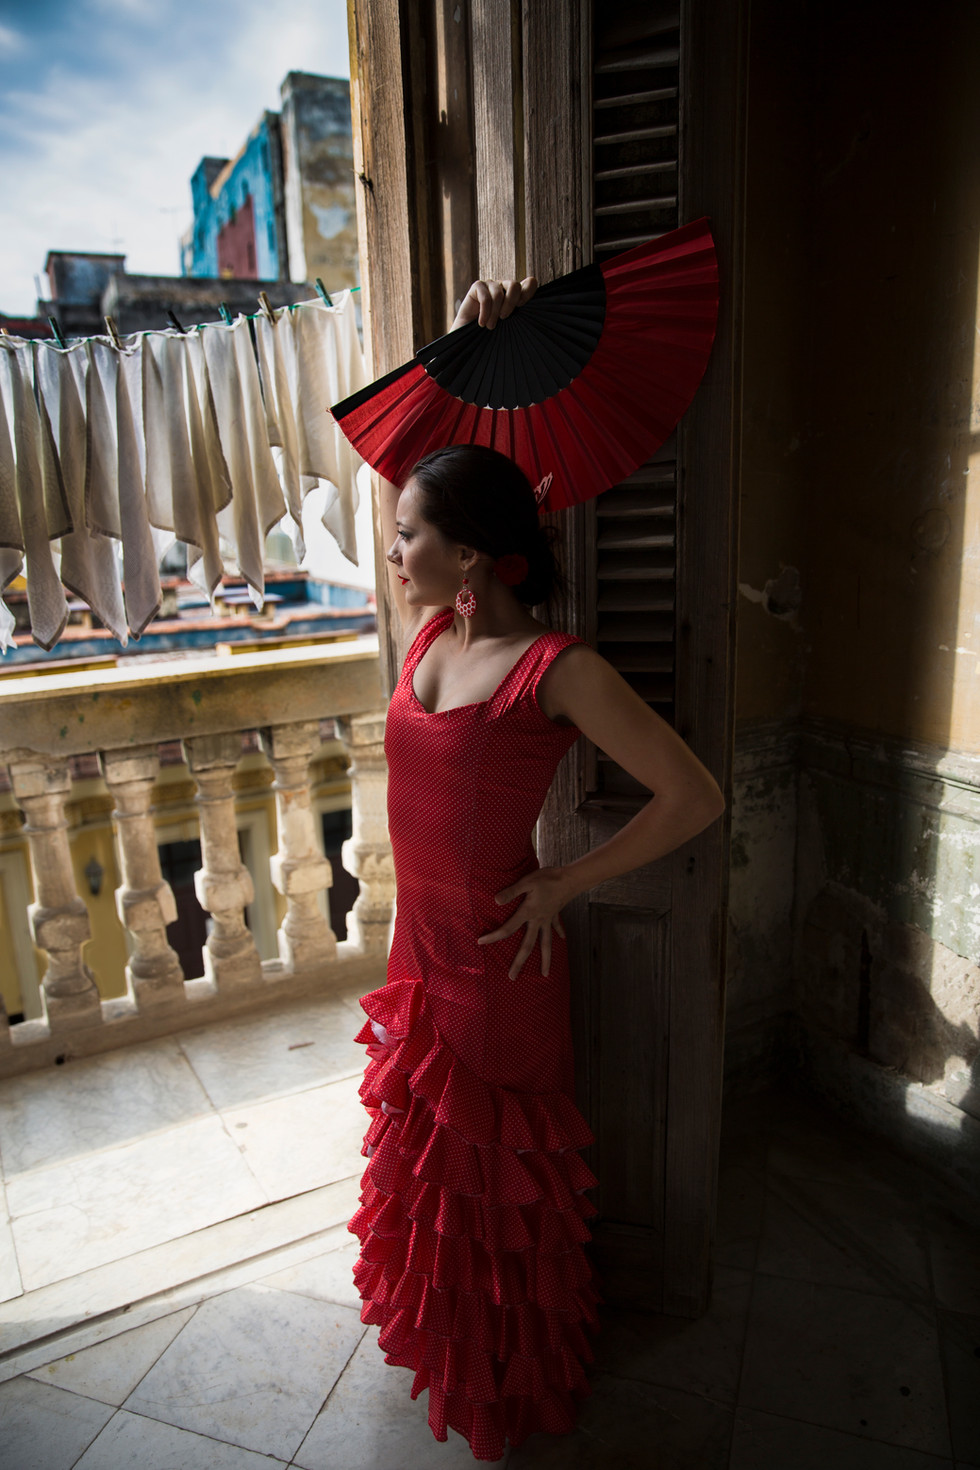 Flamenco dancer, Cuba